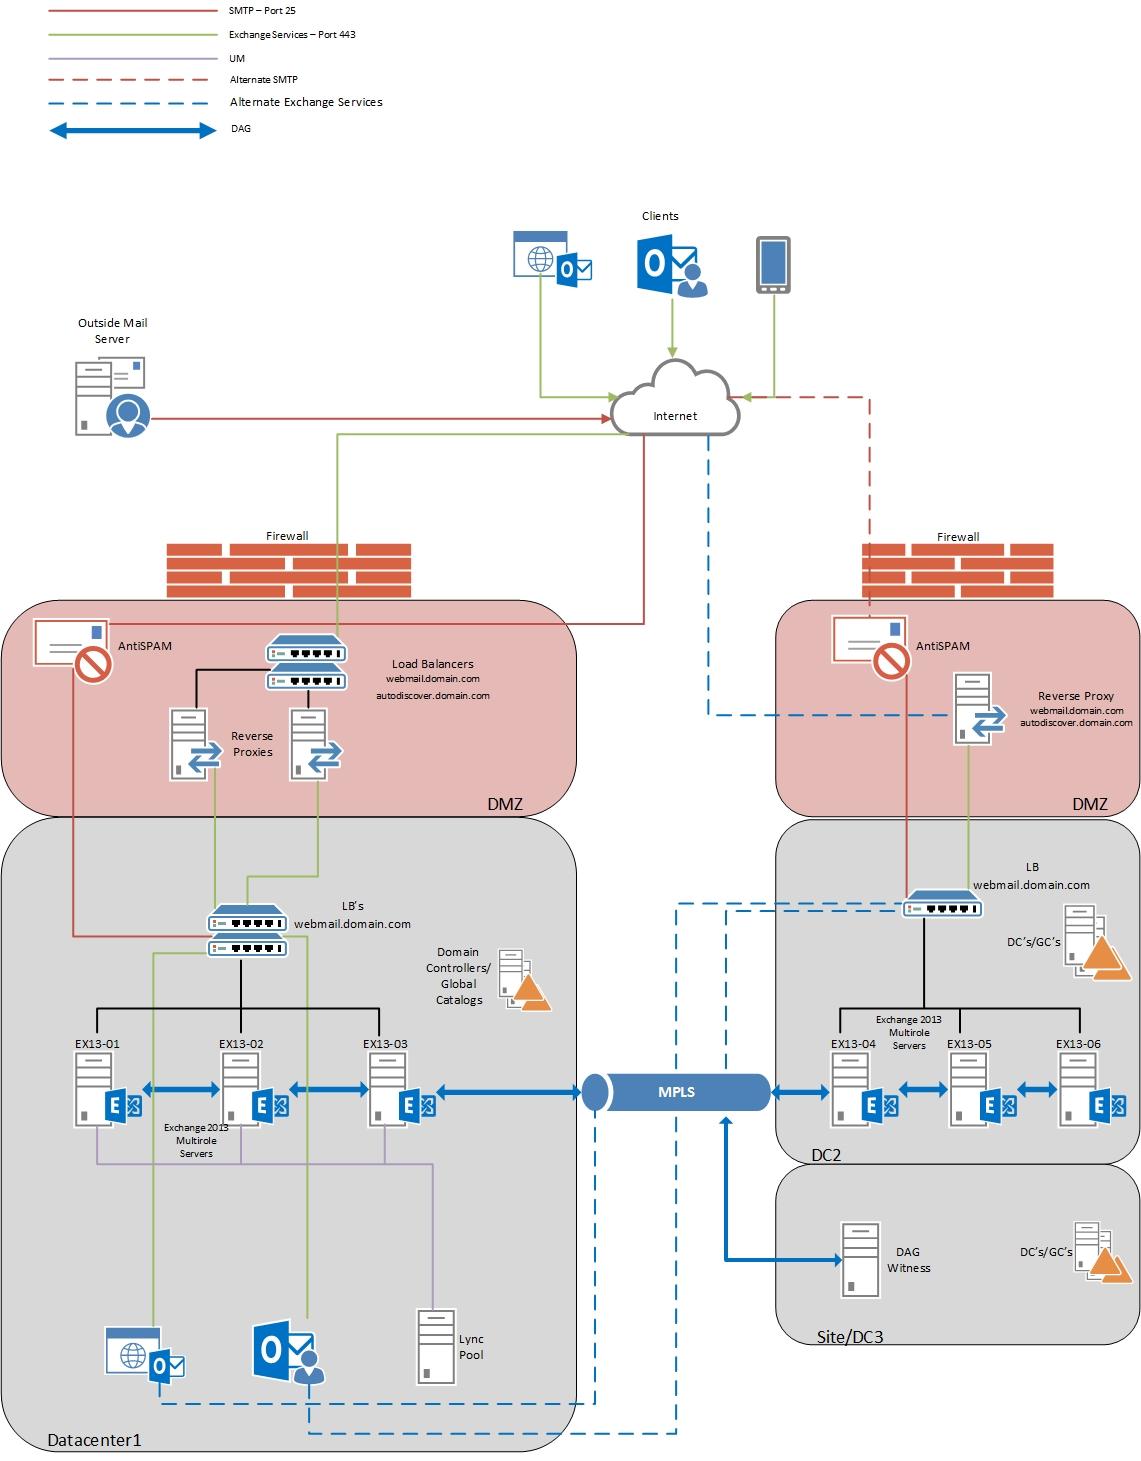 infrastructure visio diagram sail terminology exchange 2016 wiring diagrams